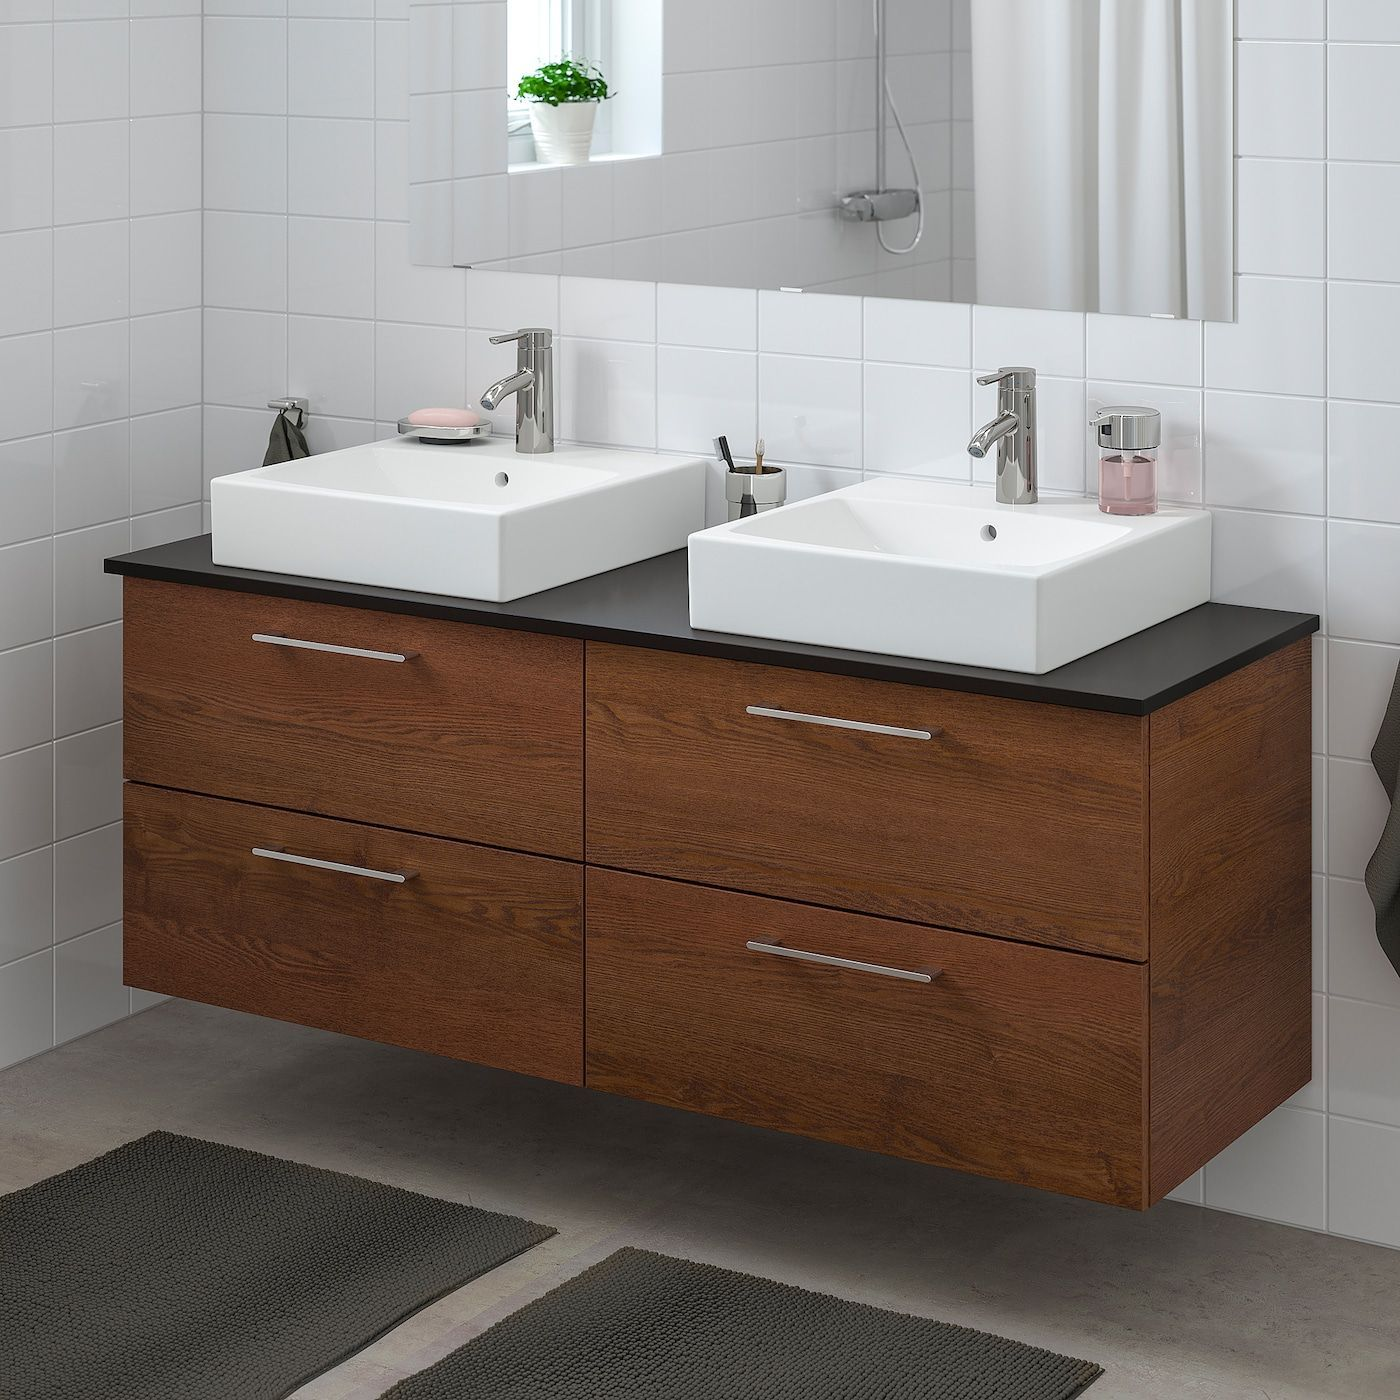 Ikea Godmorgon Tolken Tornviken Brown Stained Ash Effect